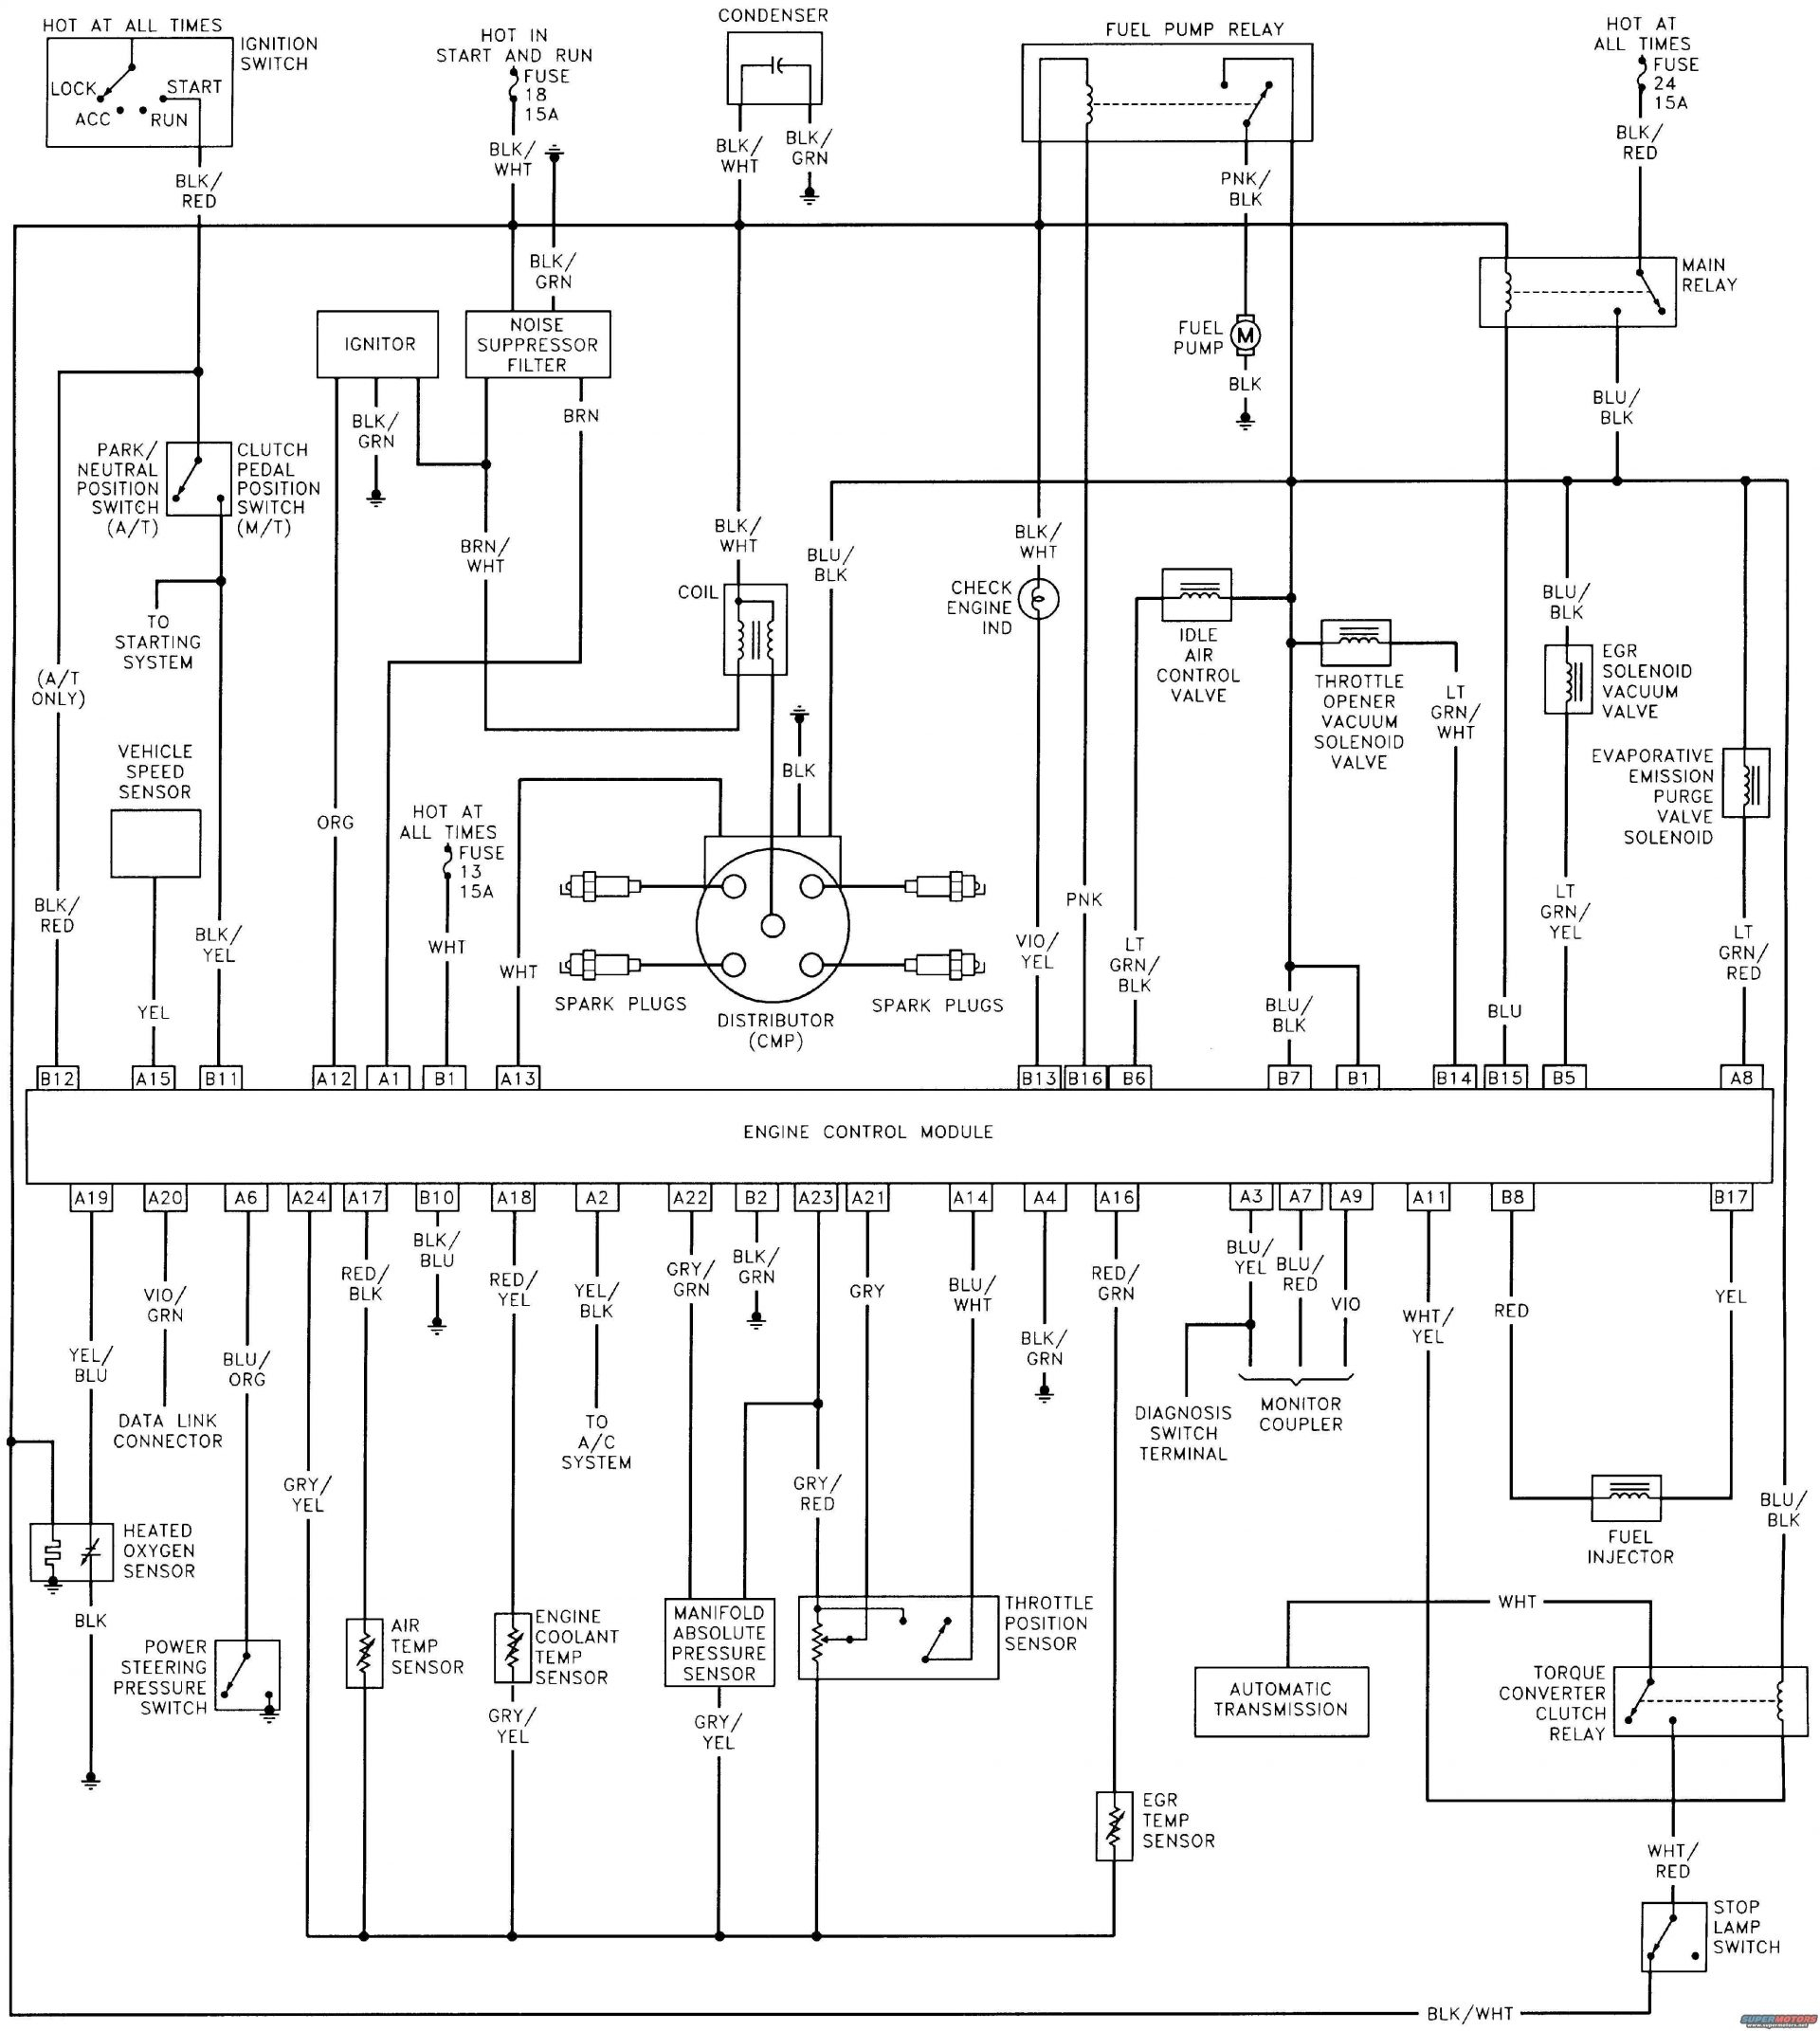 diagram] dave clark wiring diagrams full version hd quality wiring diagrams  - forexdiagrams.i-ras.it  i-ras.it